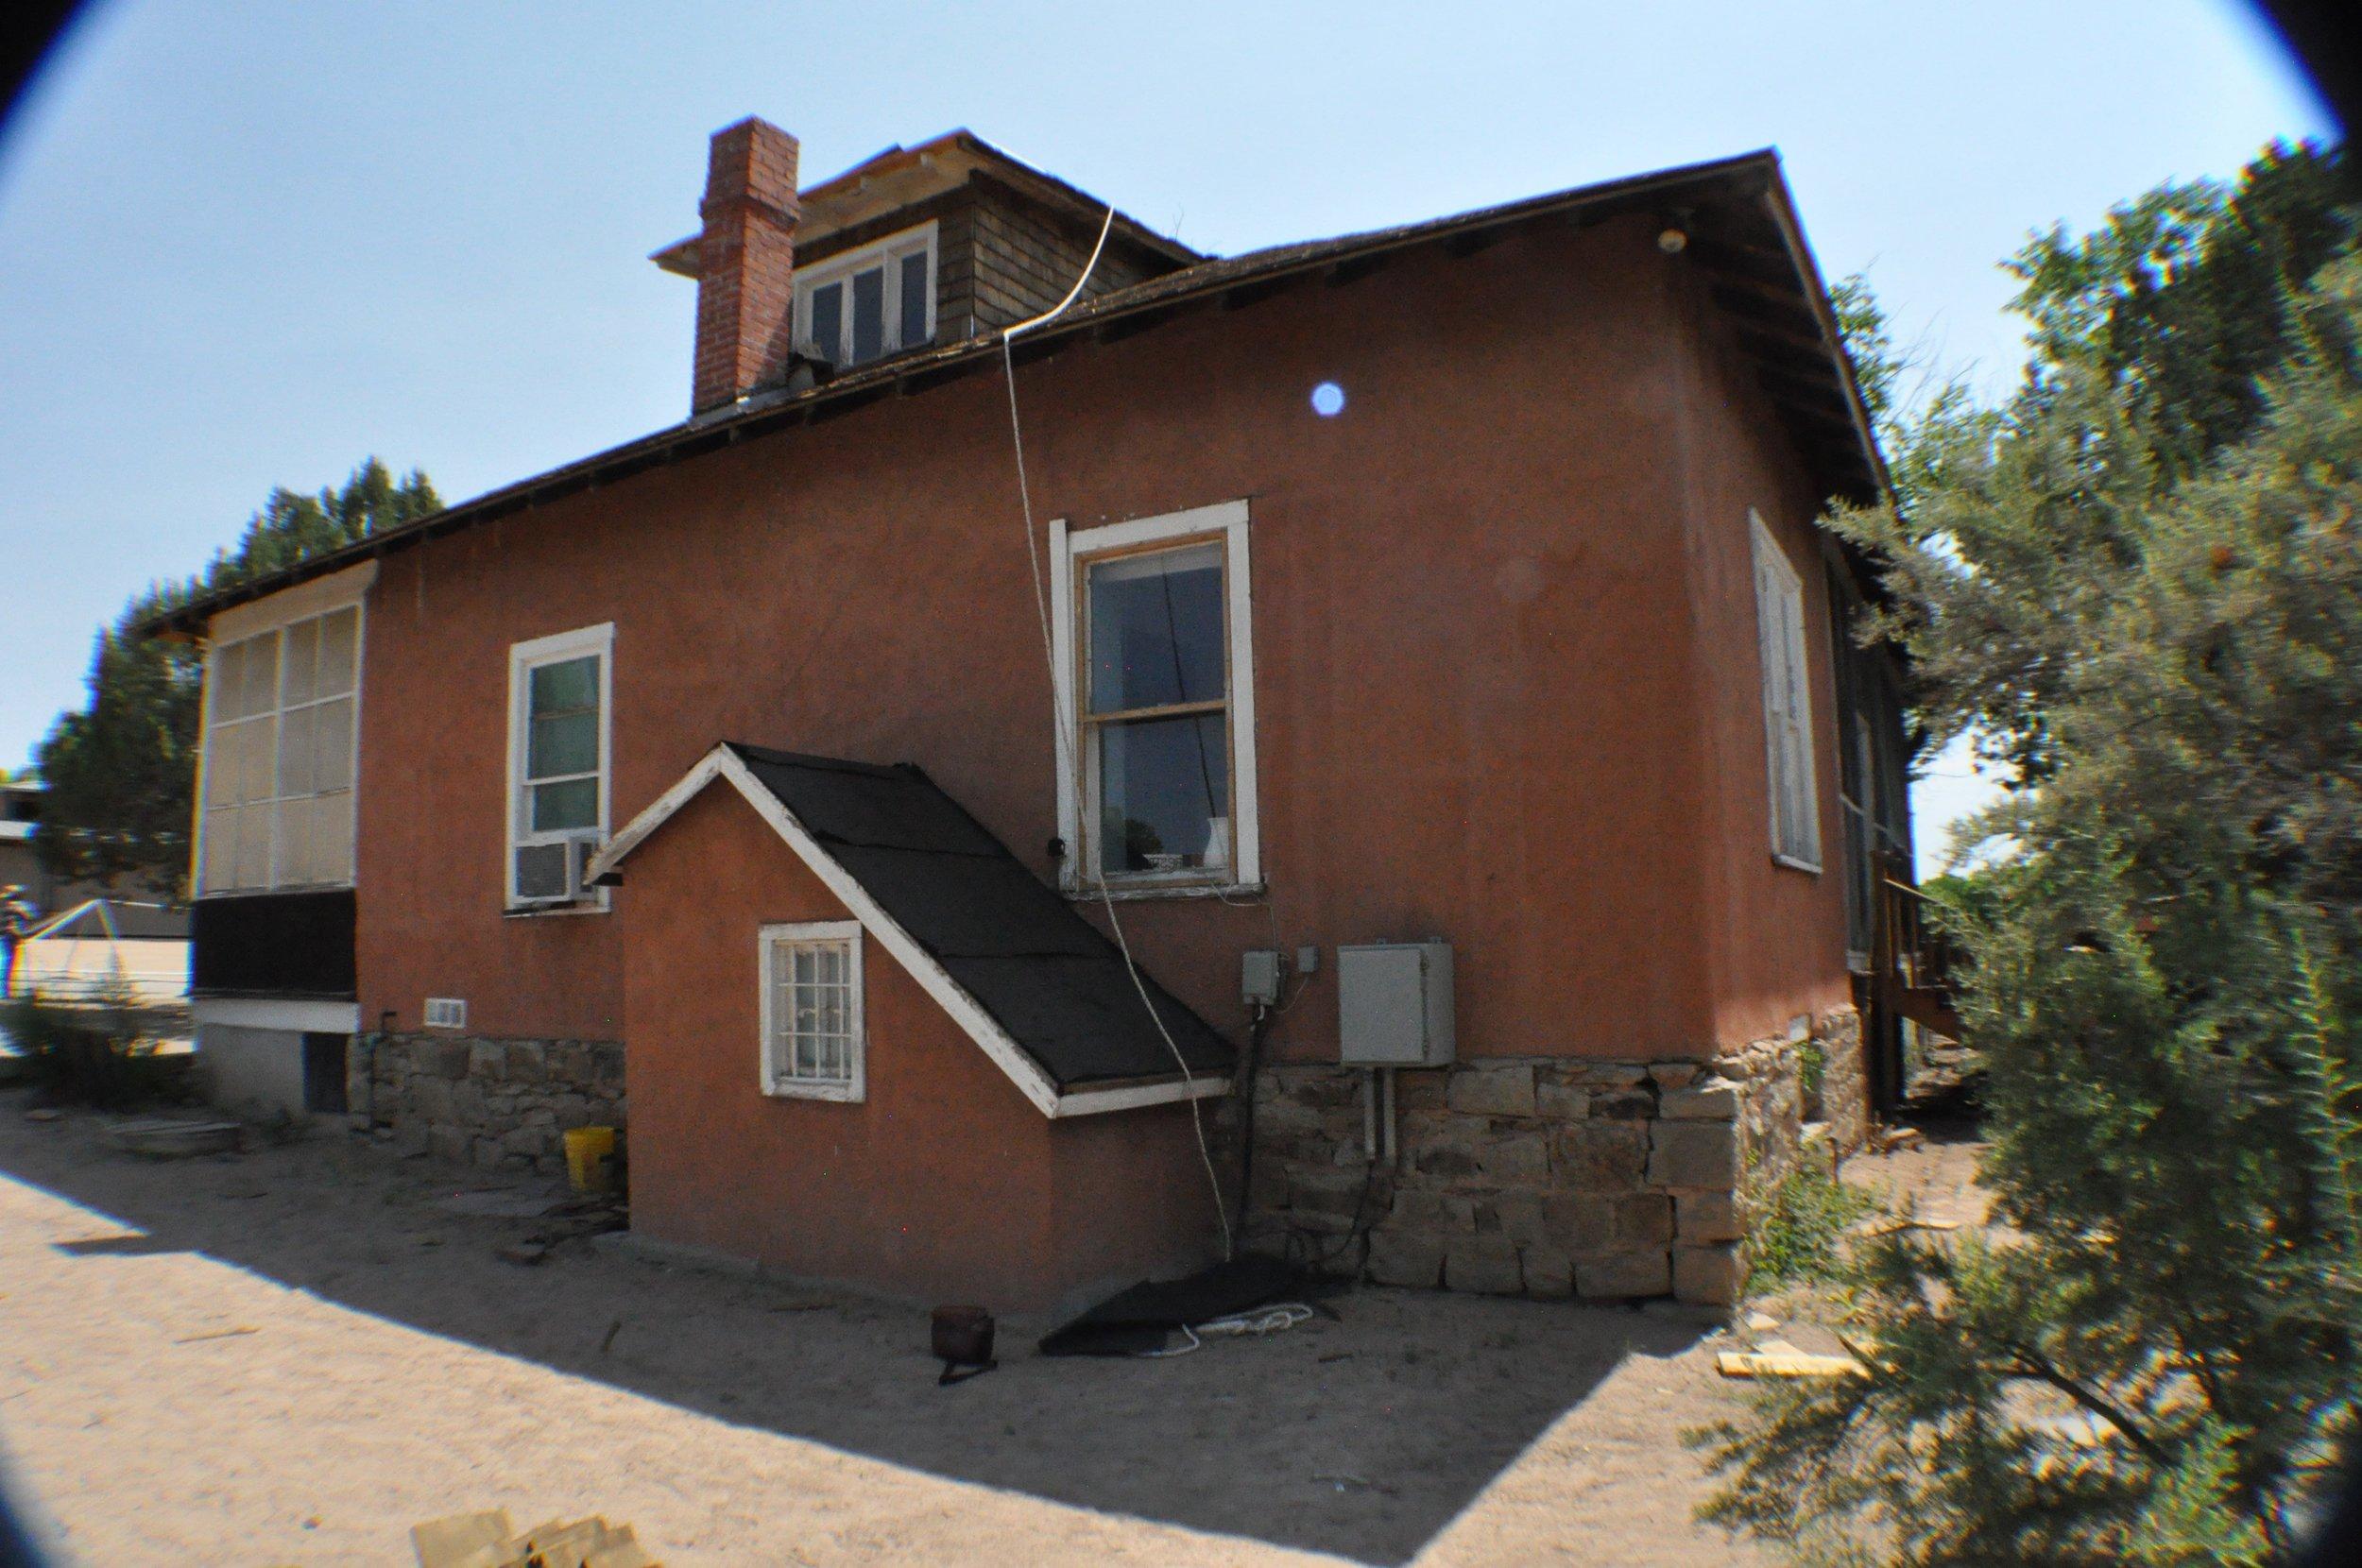 the Pino Ranch at el rancho de las golondrinas, subject of the 2018 Register fellowship by Kelly Finley Davis